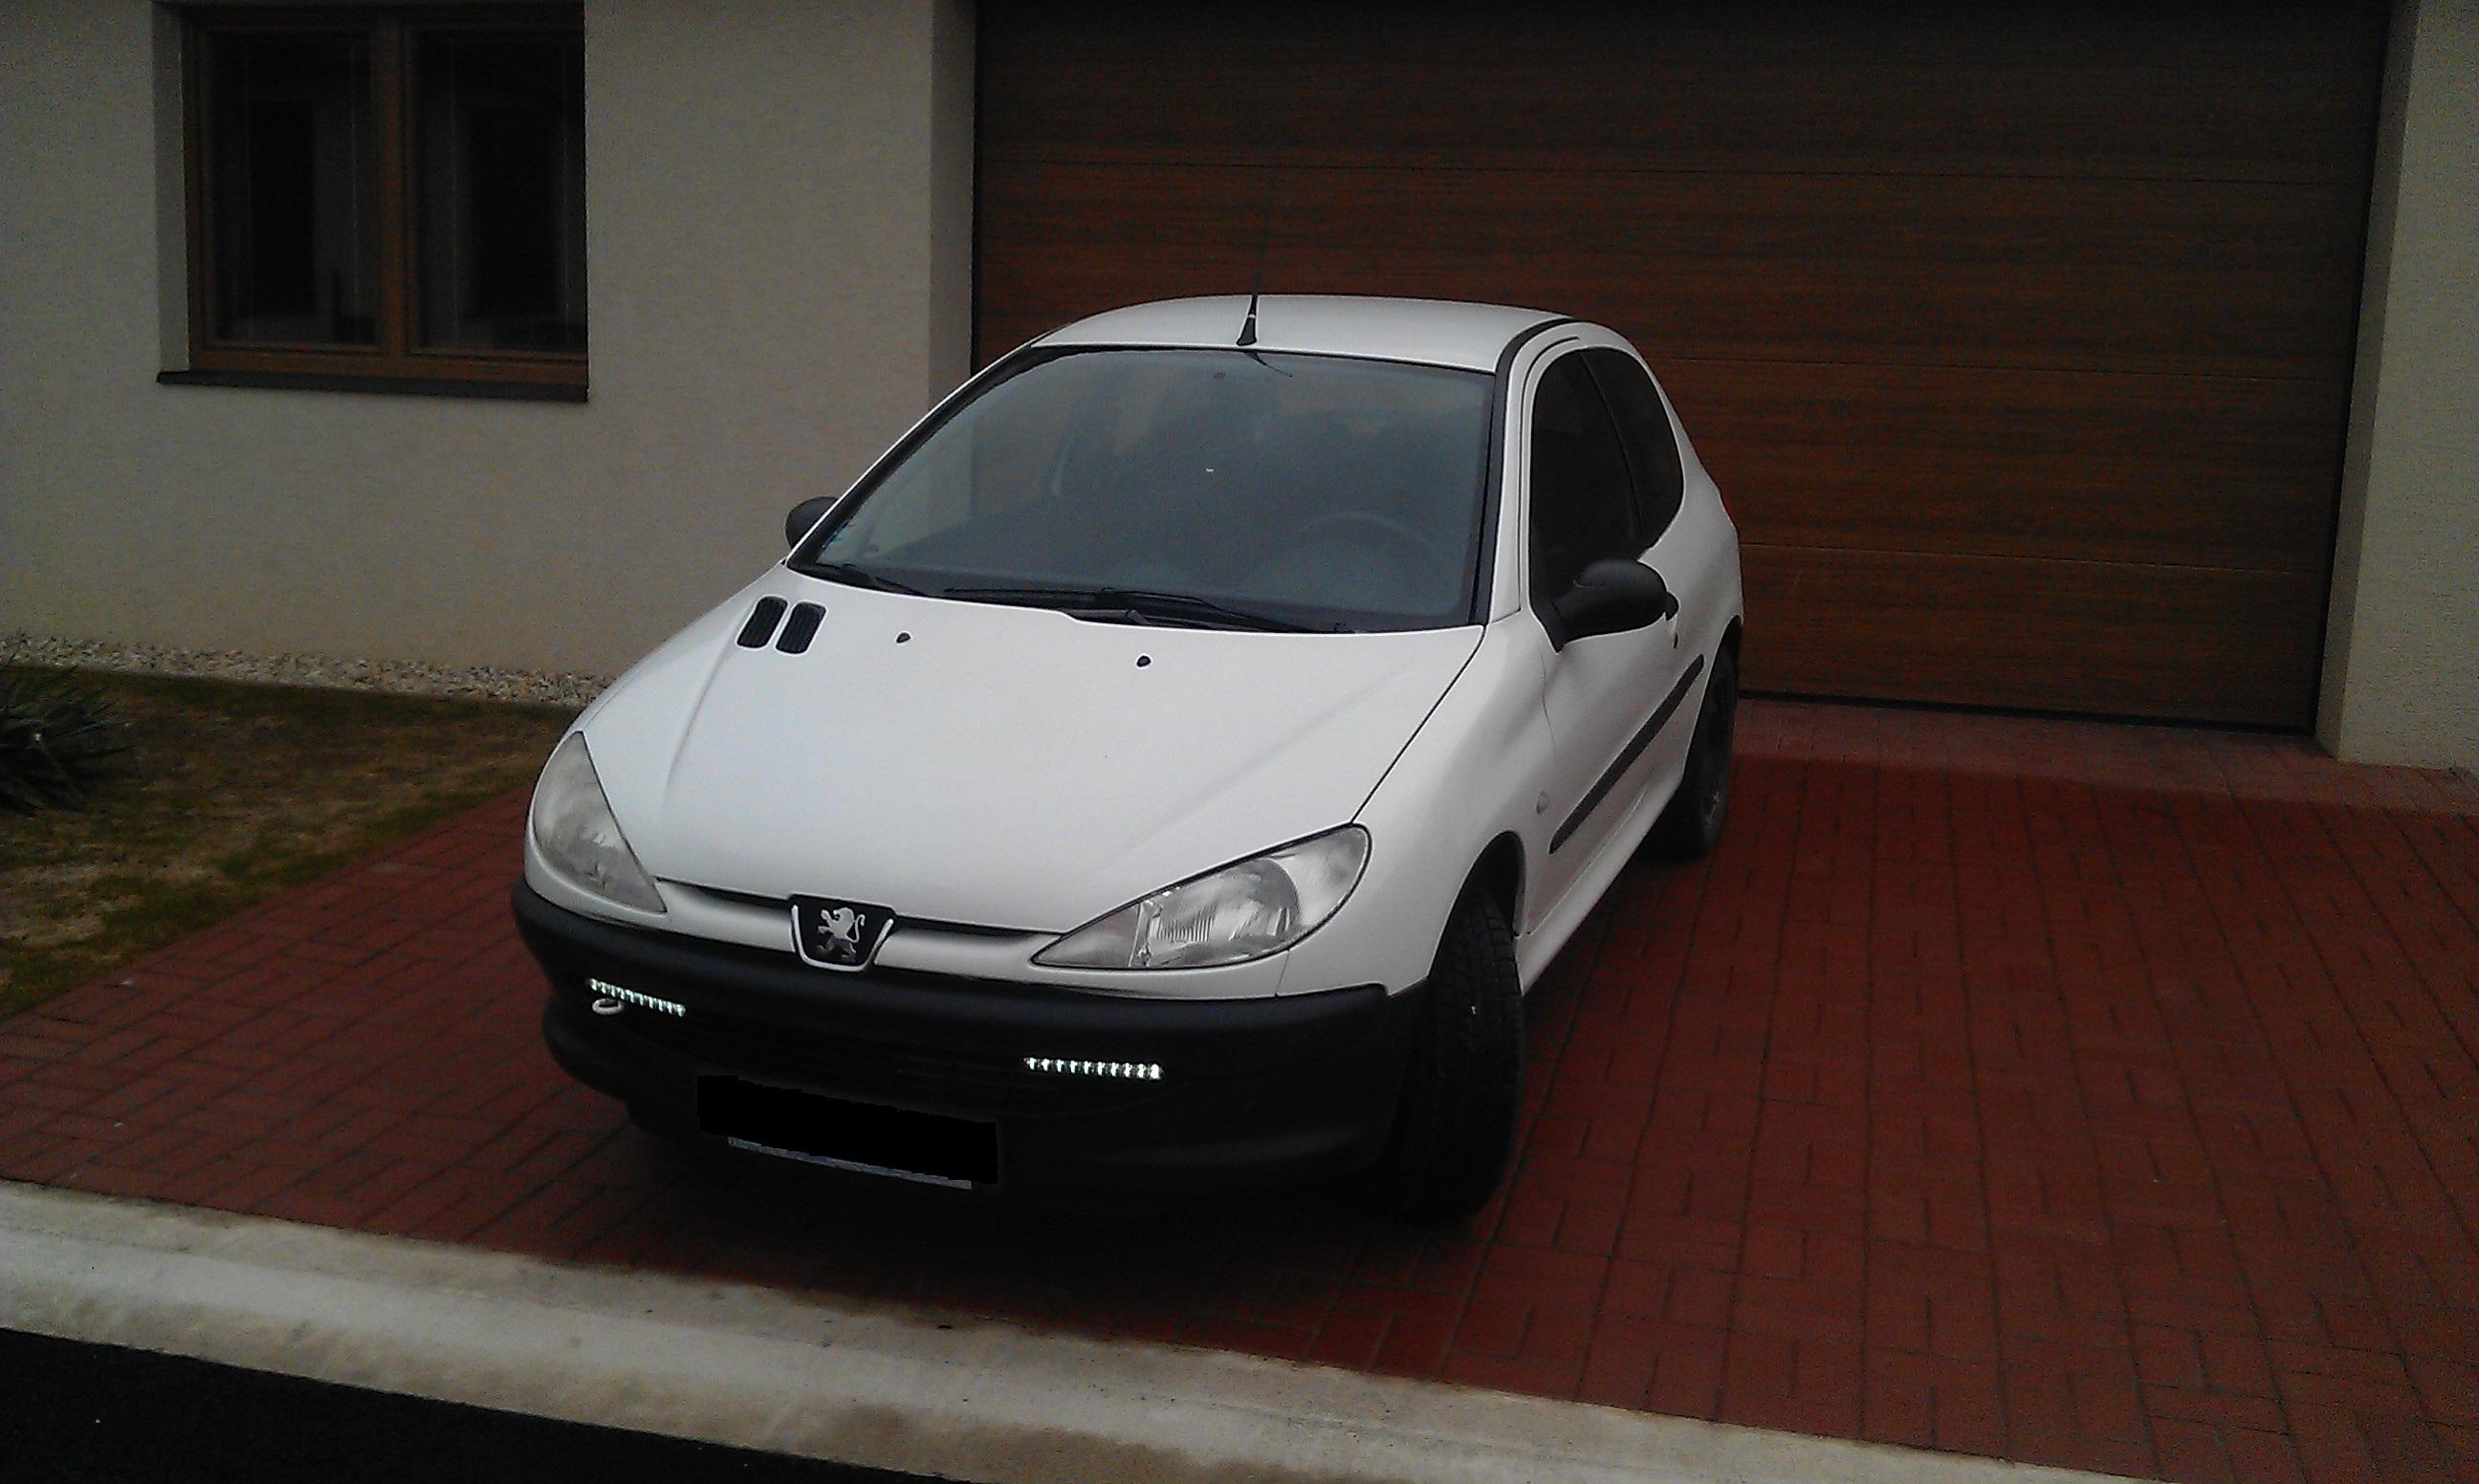 Peugeot 206 1,1i (44 kW), 3d.